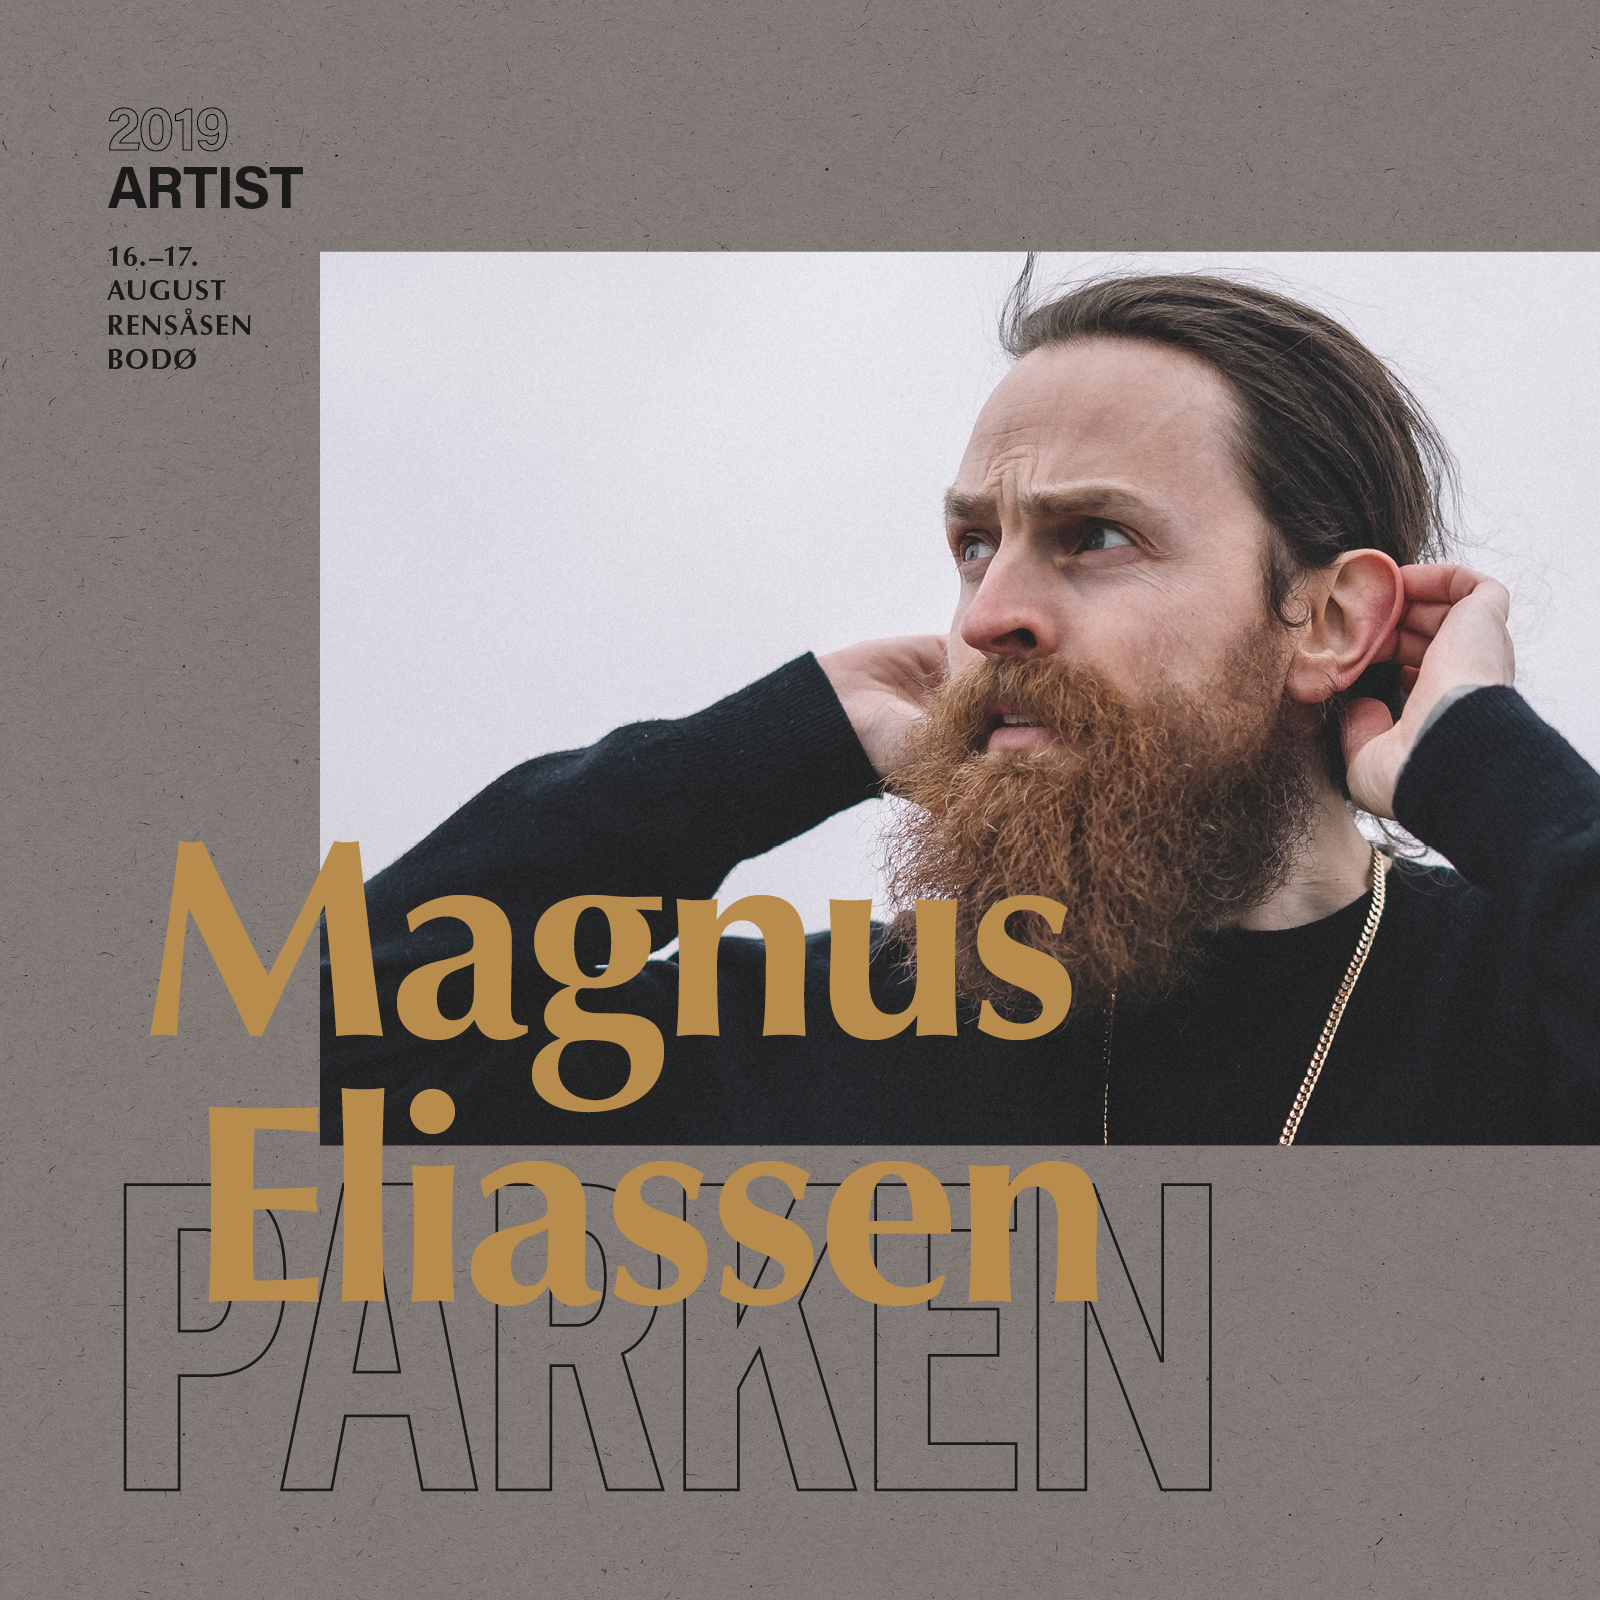 Magnus_Eliassen_19.jpeg